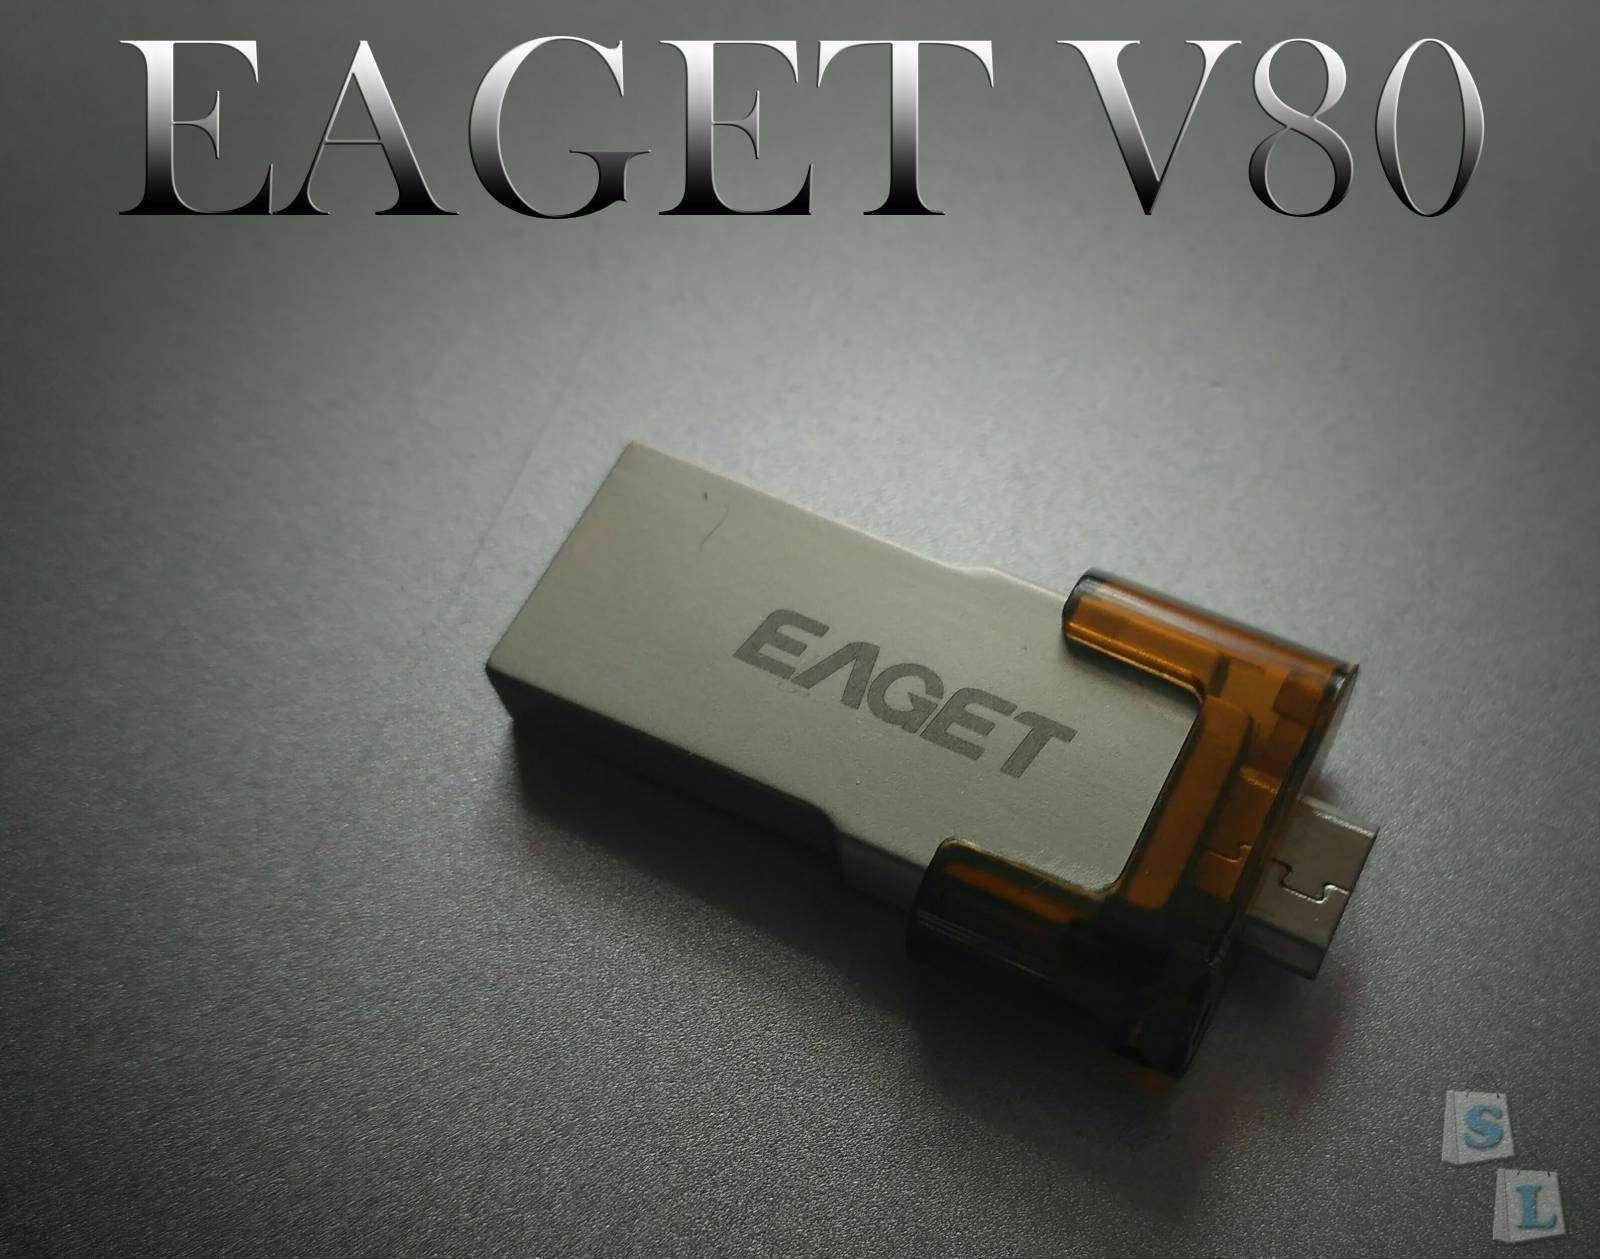 TomTop: Обзор флеш накопителя EAGET V80 64 GB USB 3.0 OTG